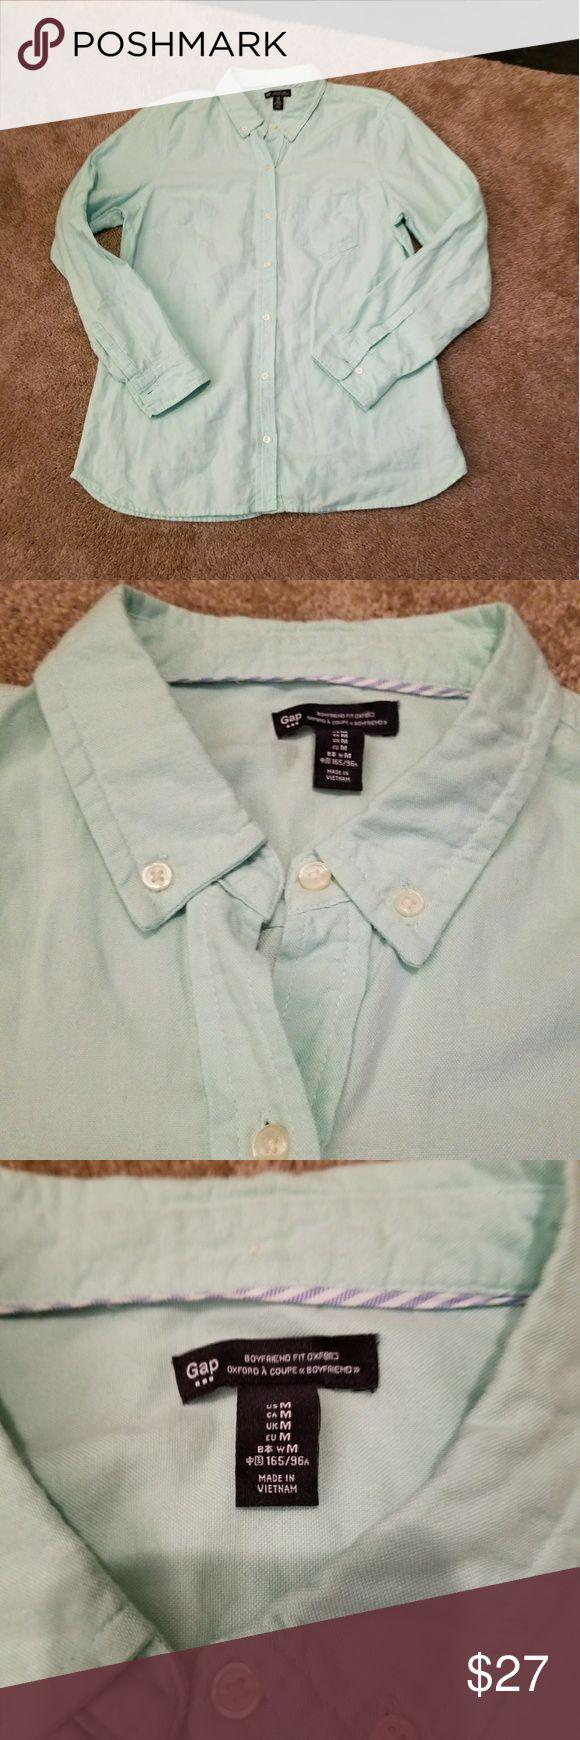 GAP Button Down Mint Shirt Lightweight button down Shirt from GAP.  Mint green color. Worn once, perfect condition! GAP Tops Button Down Shirts